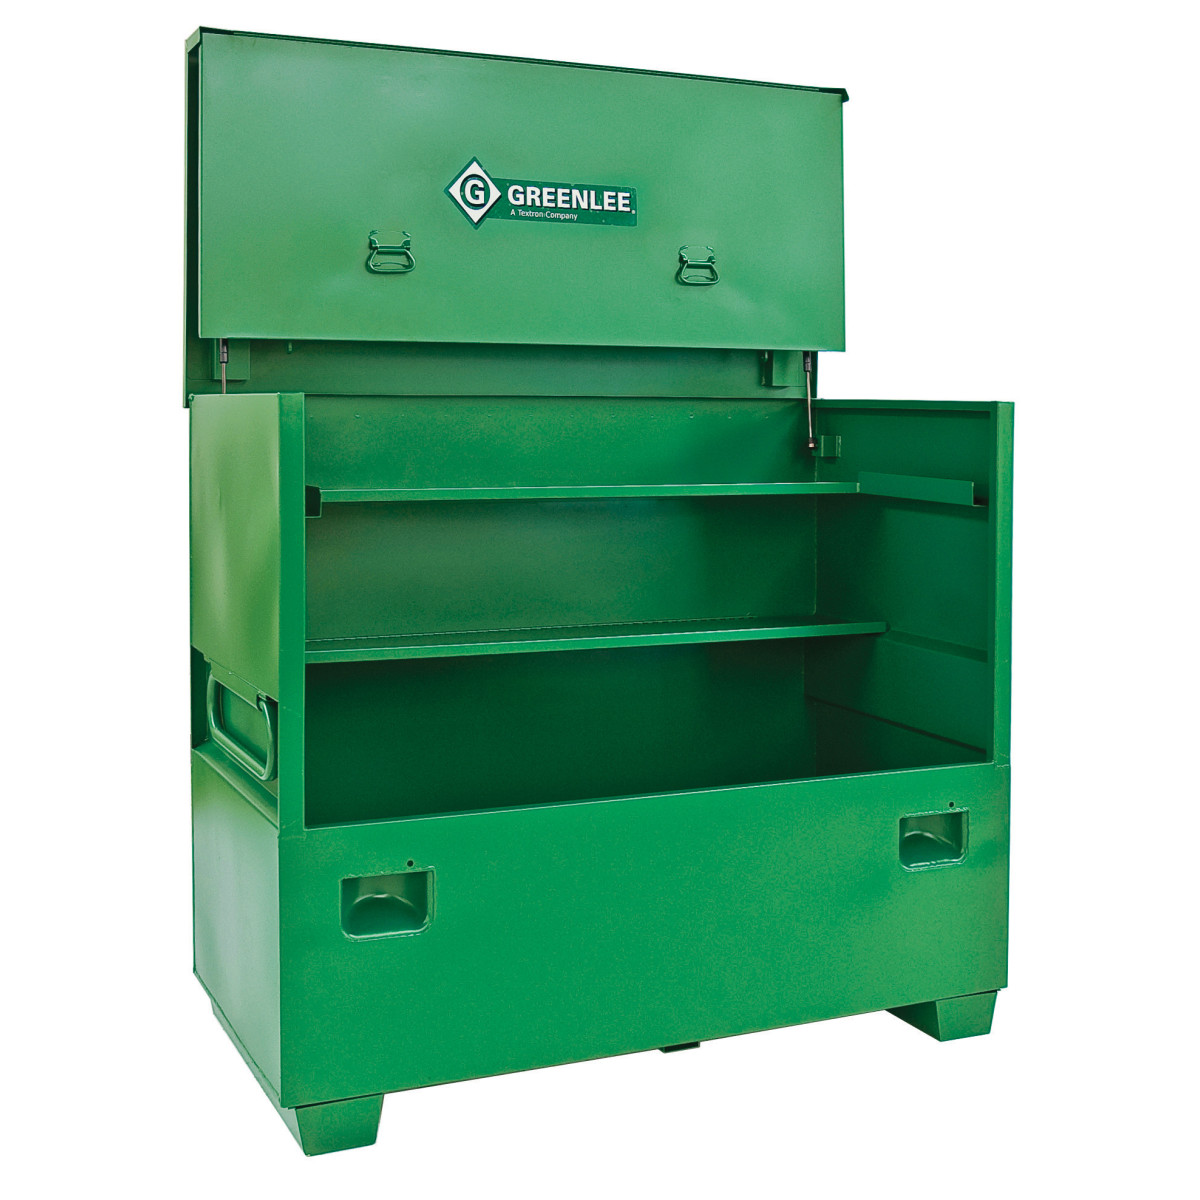 Greenlee 4860 Box Assy Flat Top (4860)